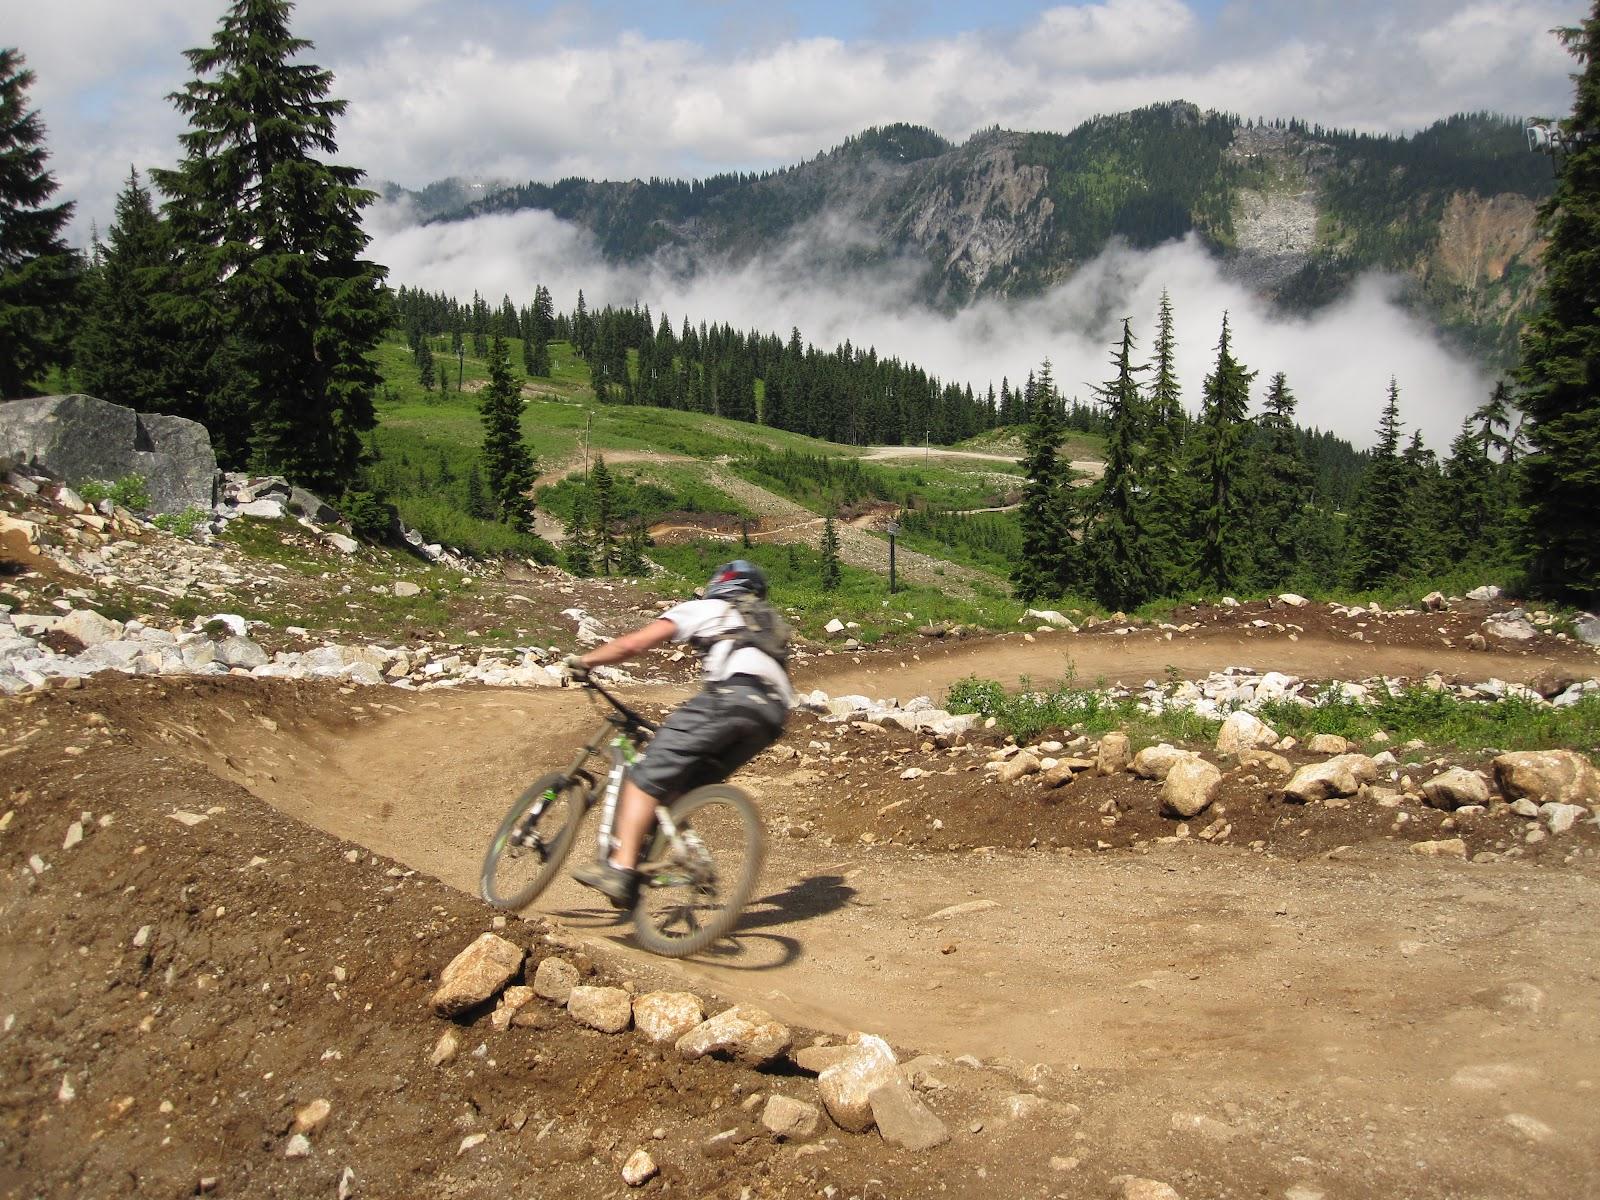 Mike Mcquaide Stevens Pass Bike Park Photos